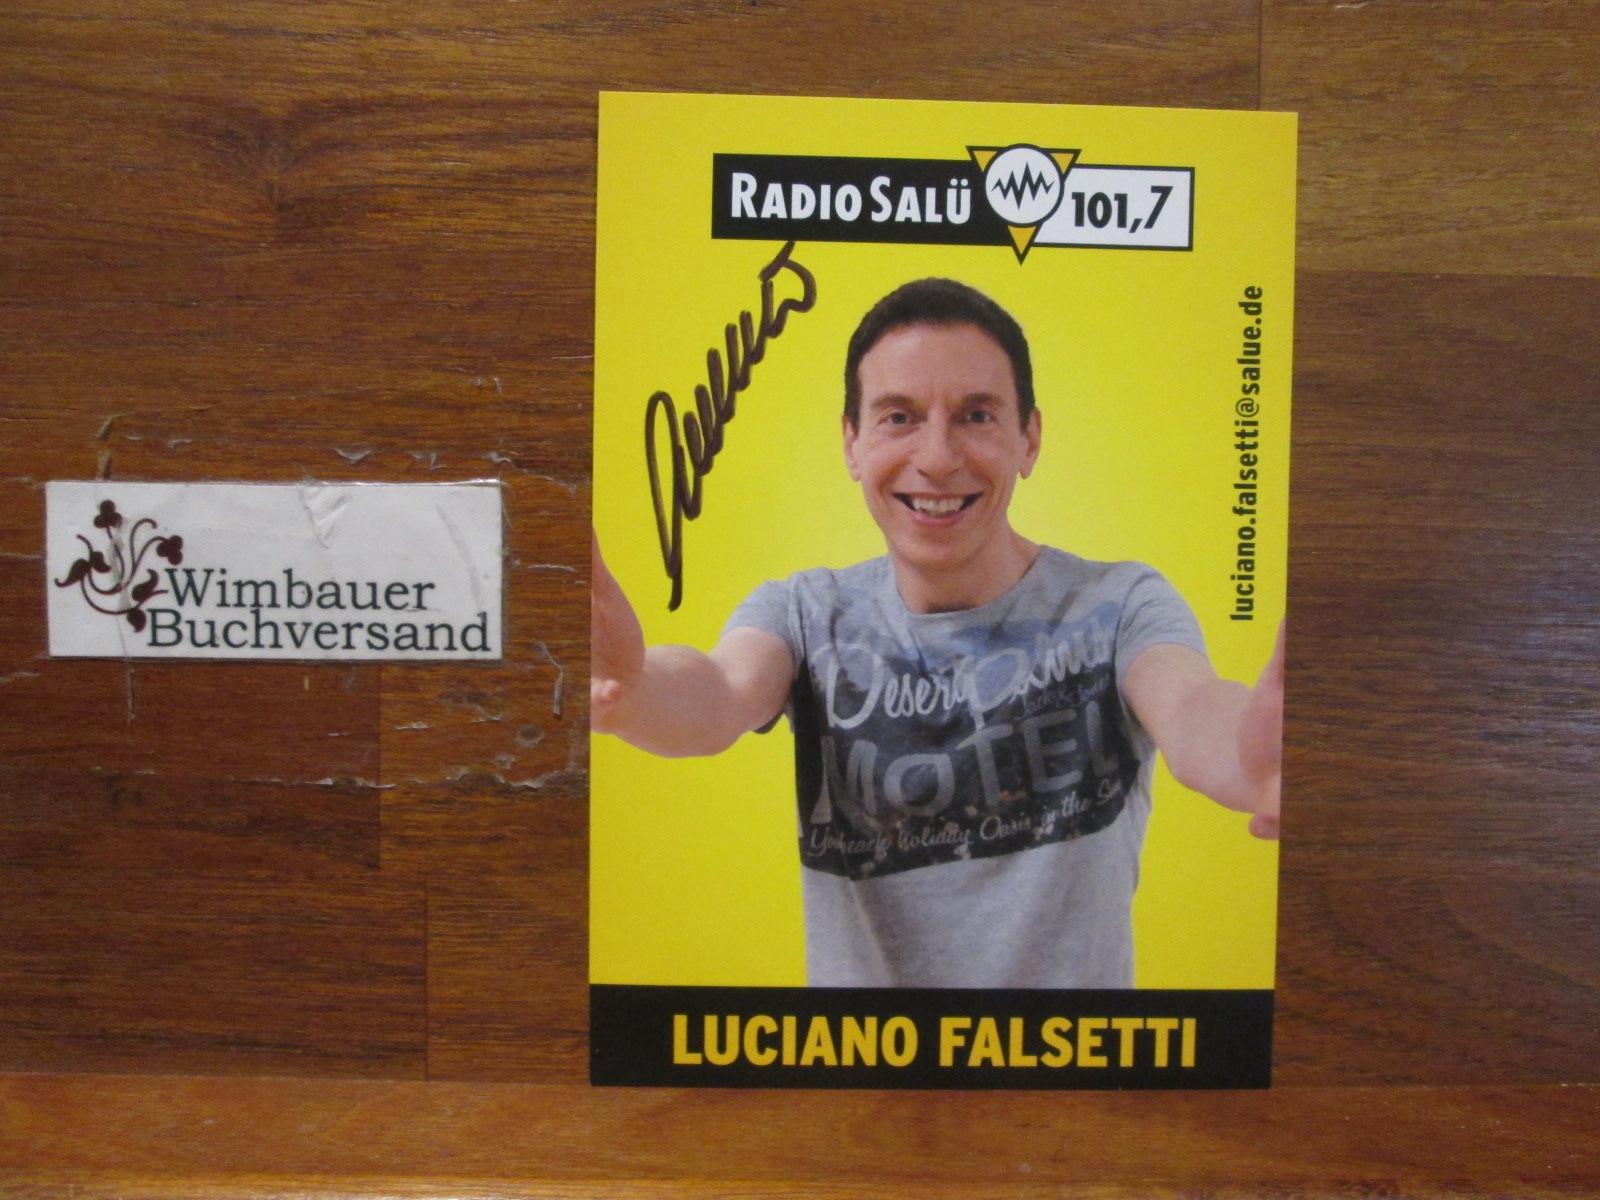 Original Autogramm Luciano Falsetti Radio Salü /// Autogramm Autograph signiert signed signee